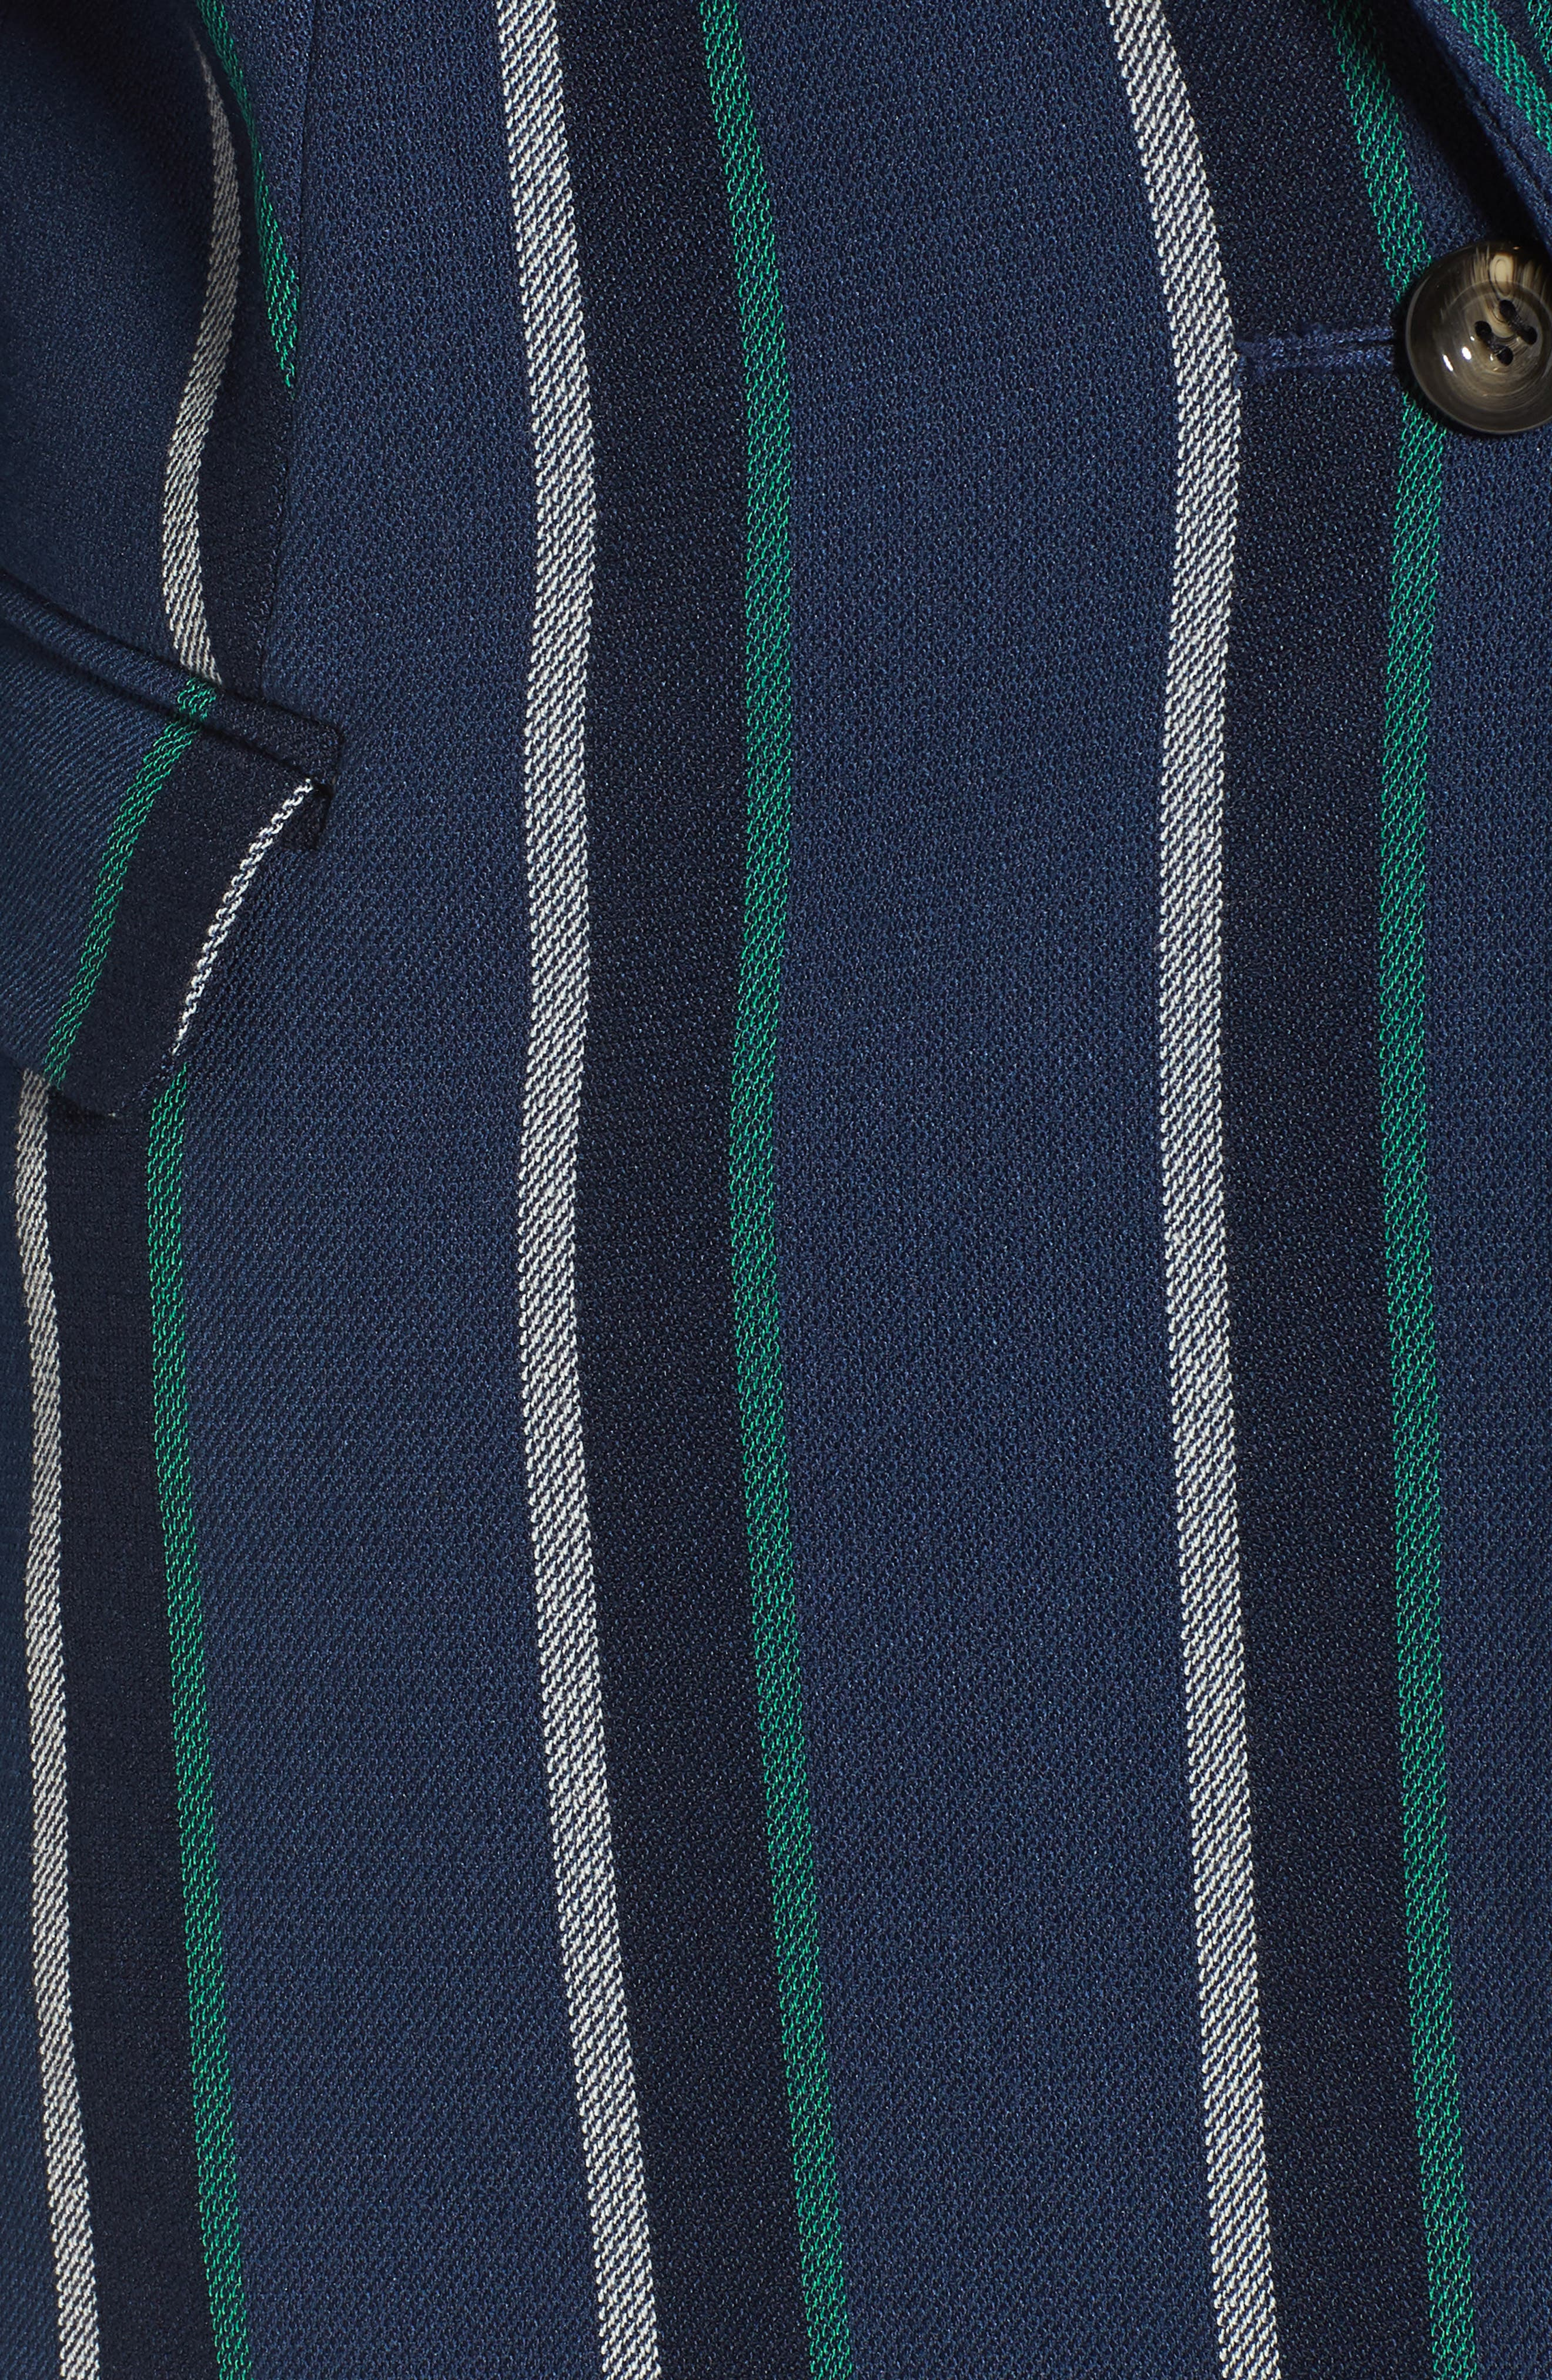 Stripe Blazer,                             Alternate thumbnail 7, color,                             NAVY SEAFOAM